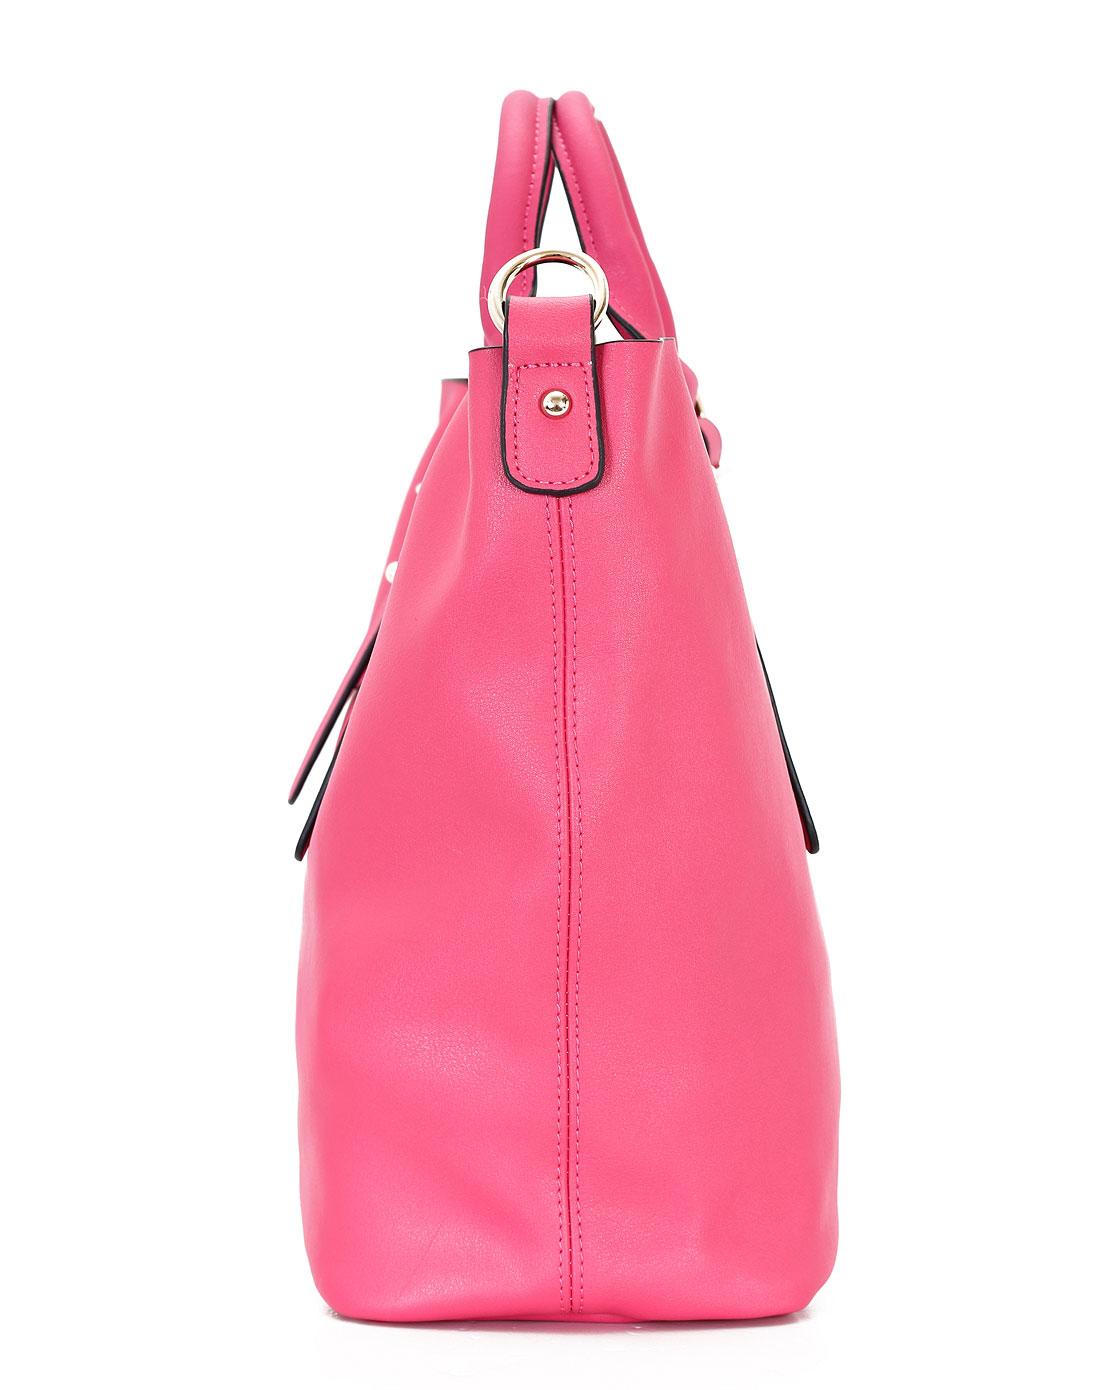 doris女款梅红色时尚手提包中包wb4008s